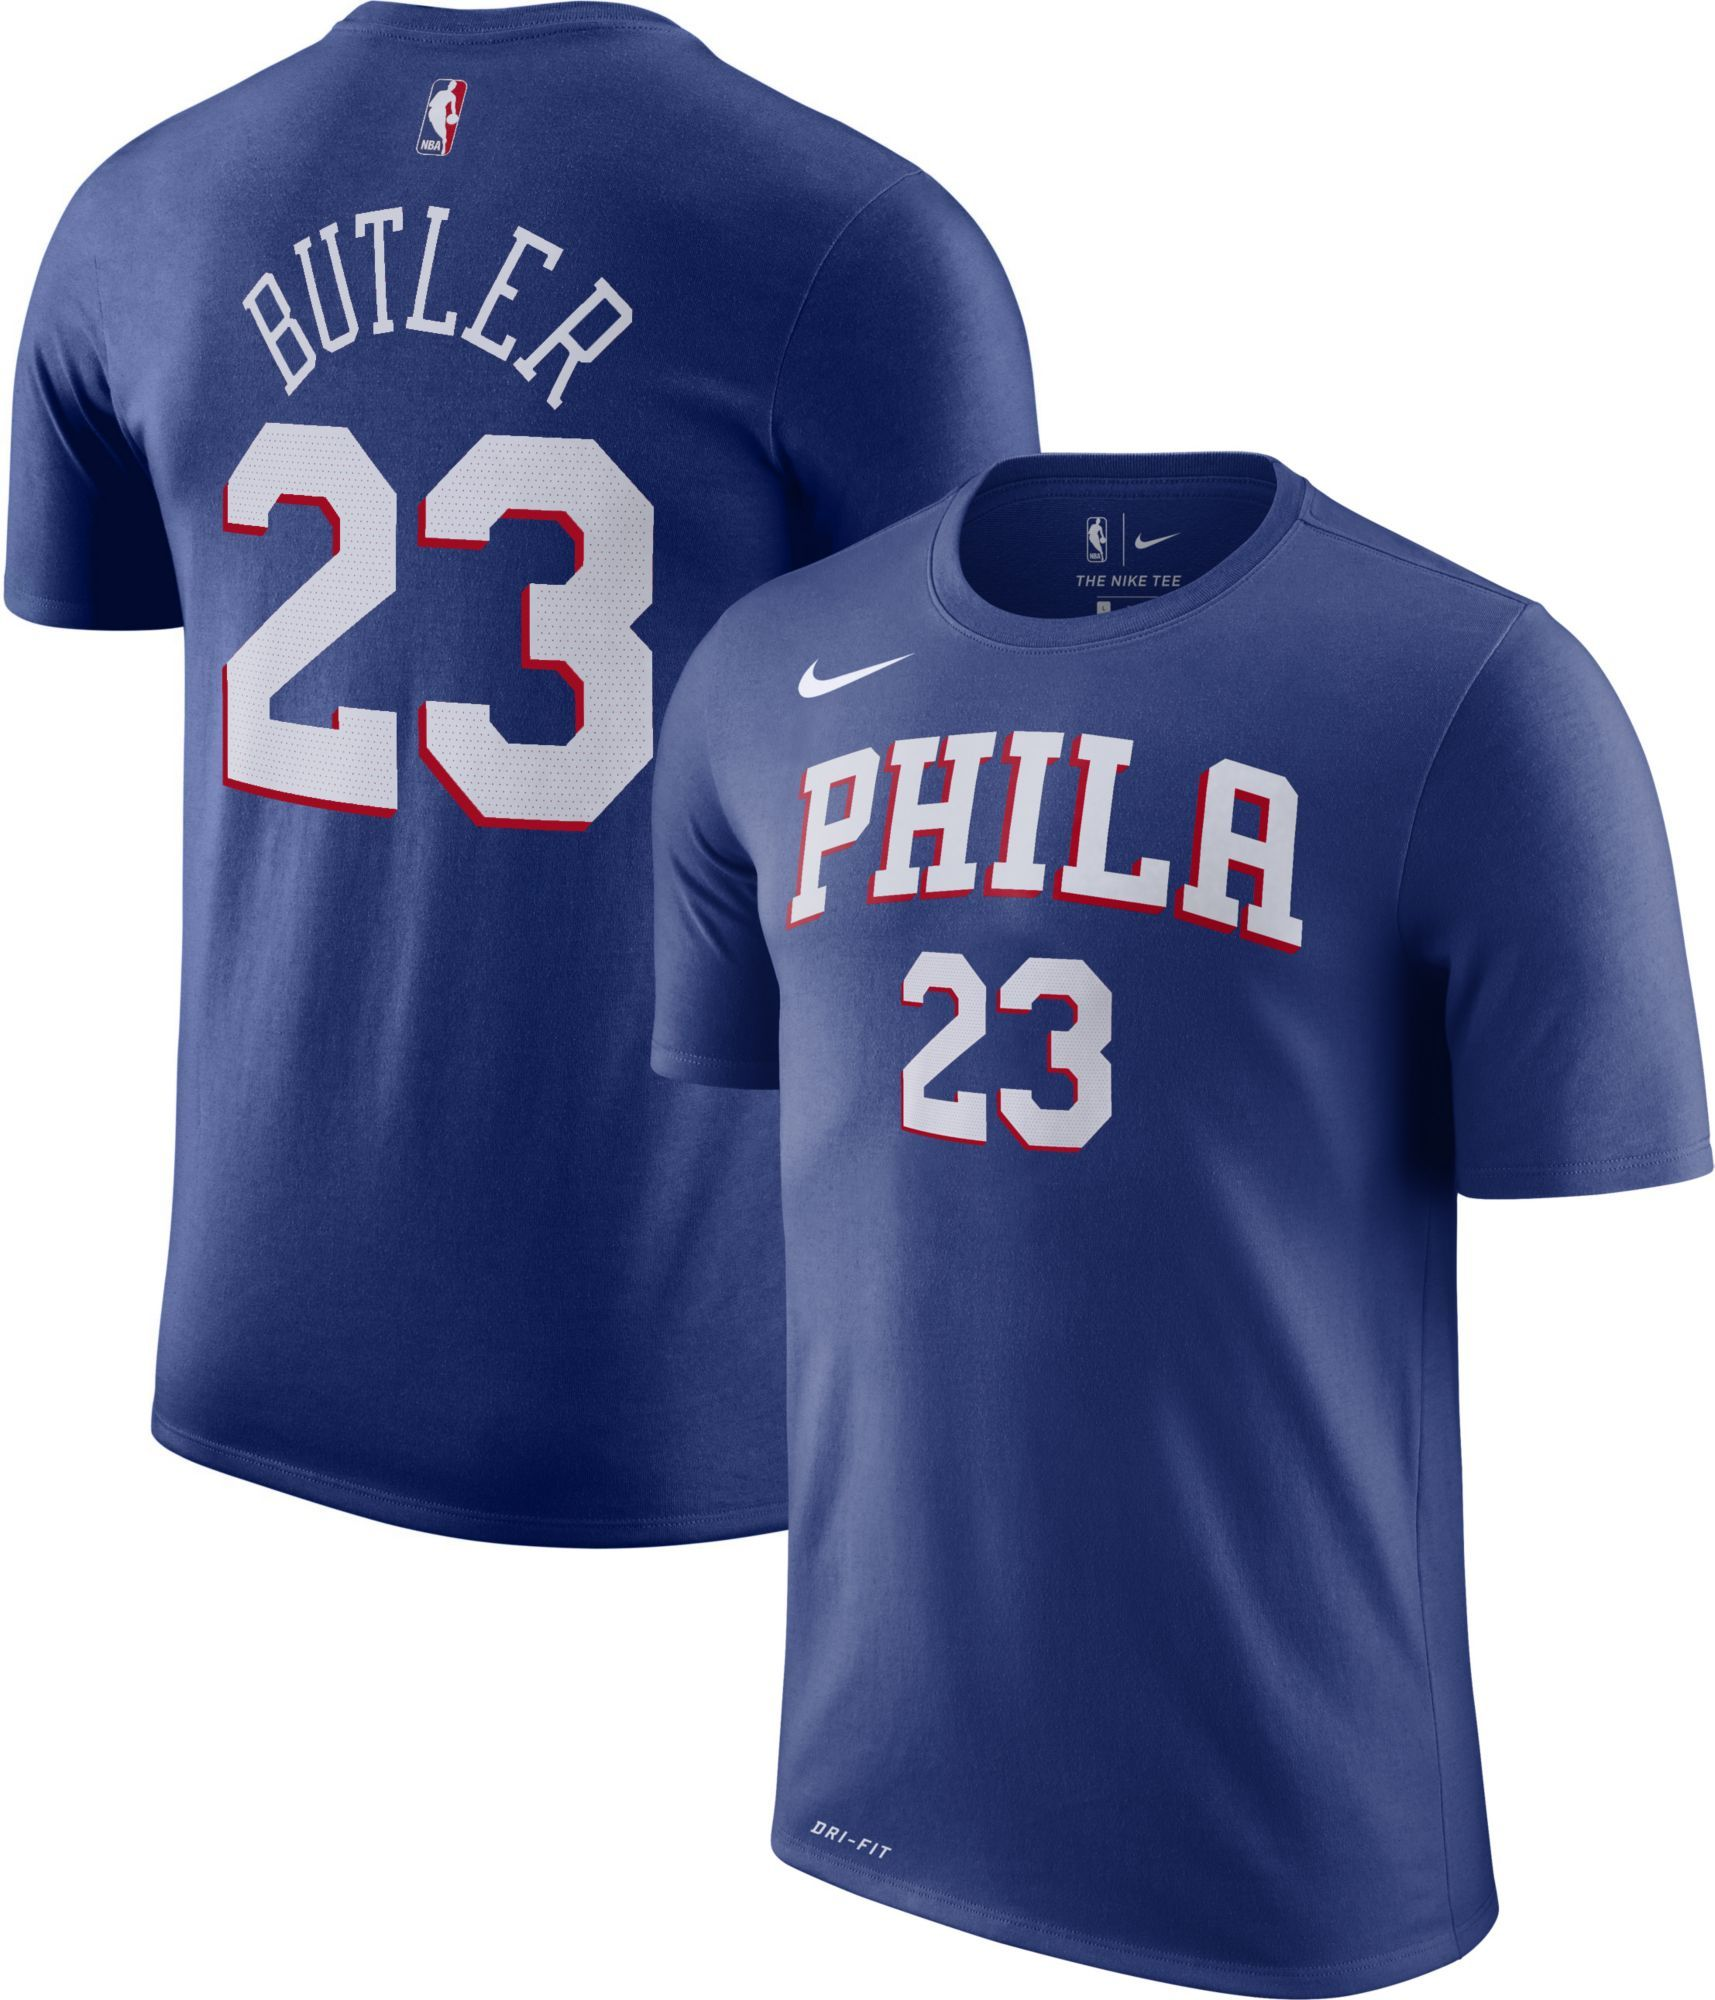 new arrival 033ad 0979b Nike Youth Philadelphia 76ers Jimmy Butler #23 Dri-FIT Royal ...